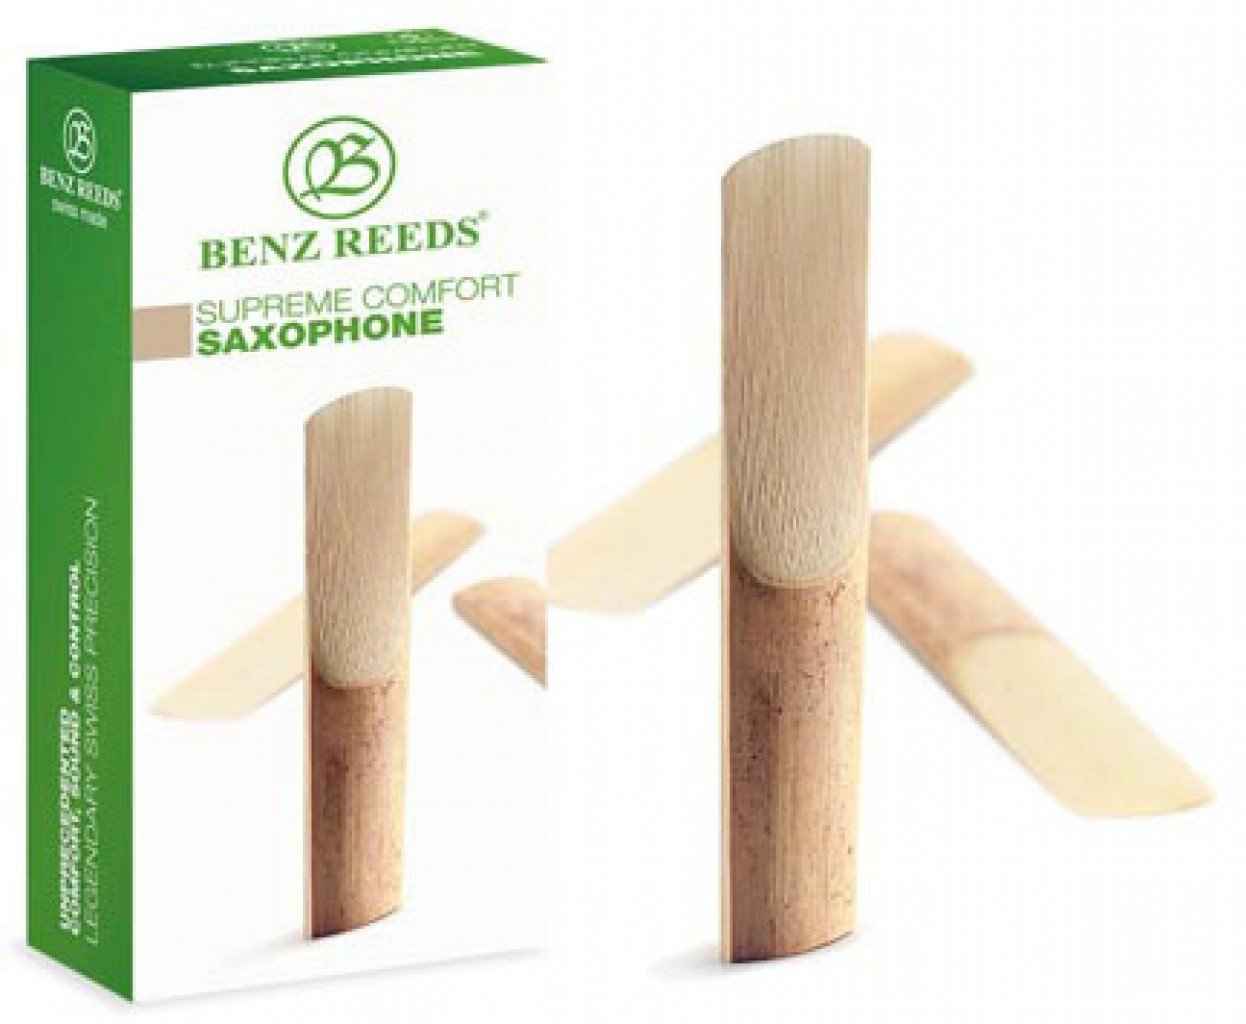 Benz Reeds BSC5ST25 Tenor Saxophone Comfort Reeds - 2.5 Strength - Pack of 5